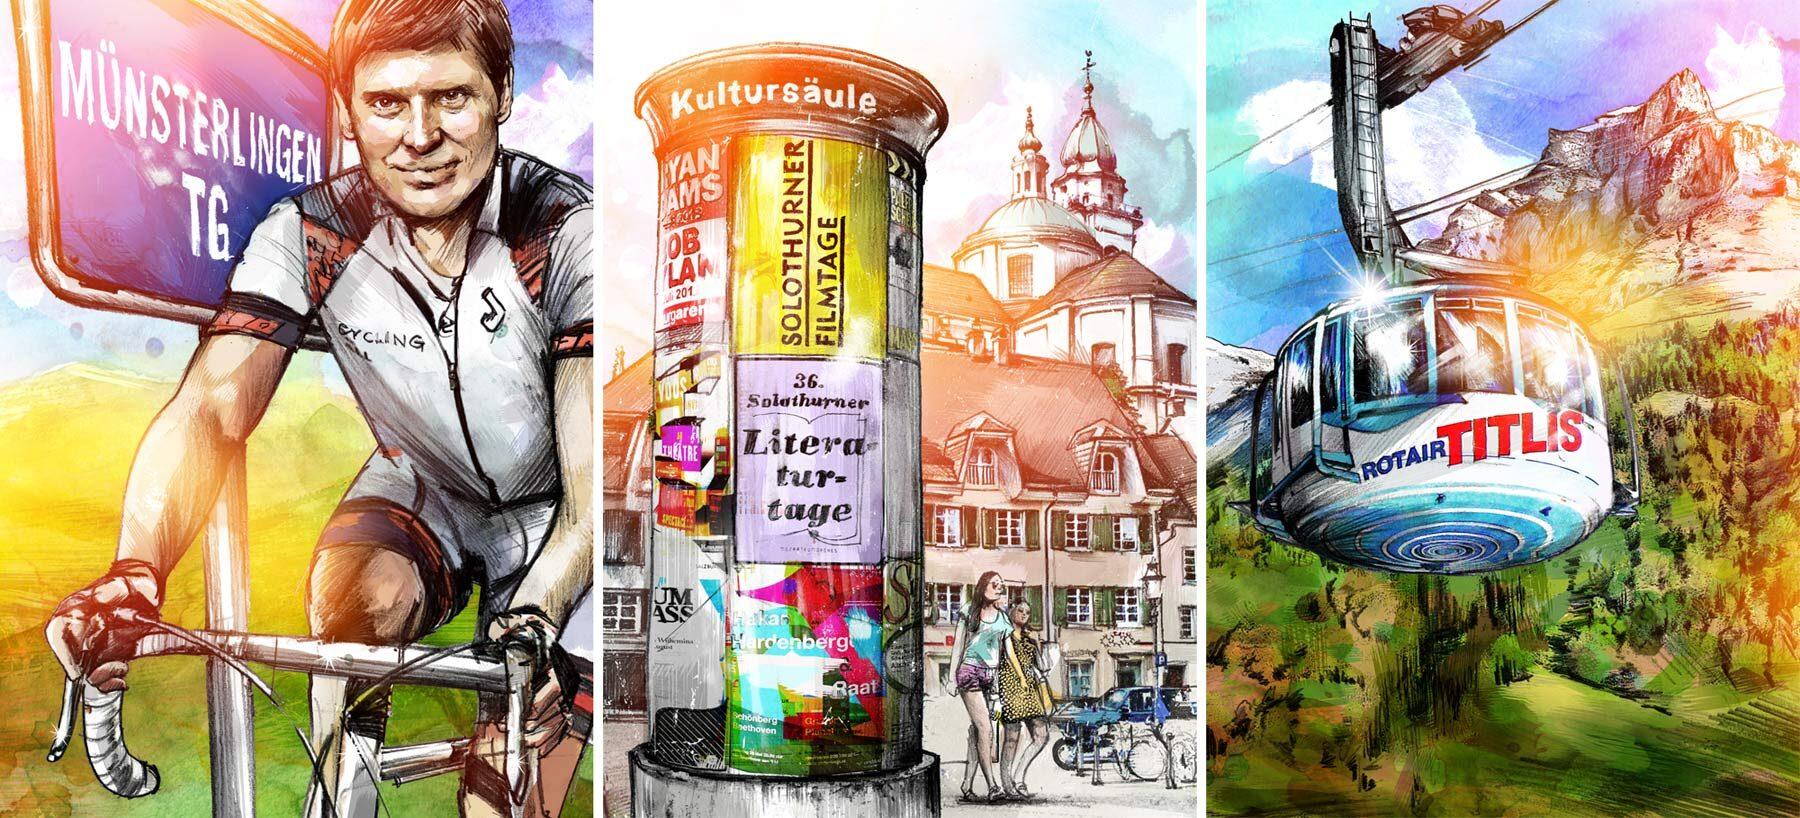 Gemeinderating - Kornel Illustration | Kornel Stadler portfolio